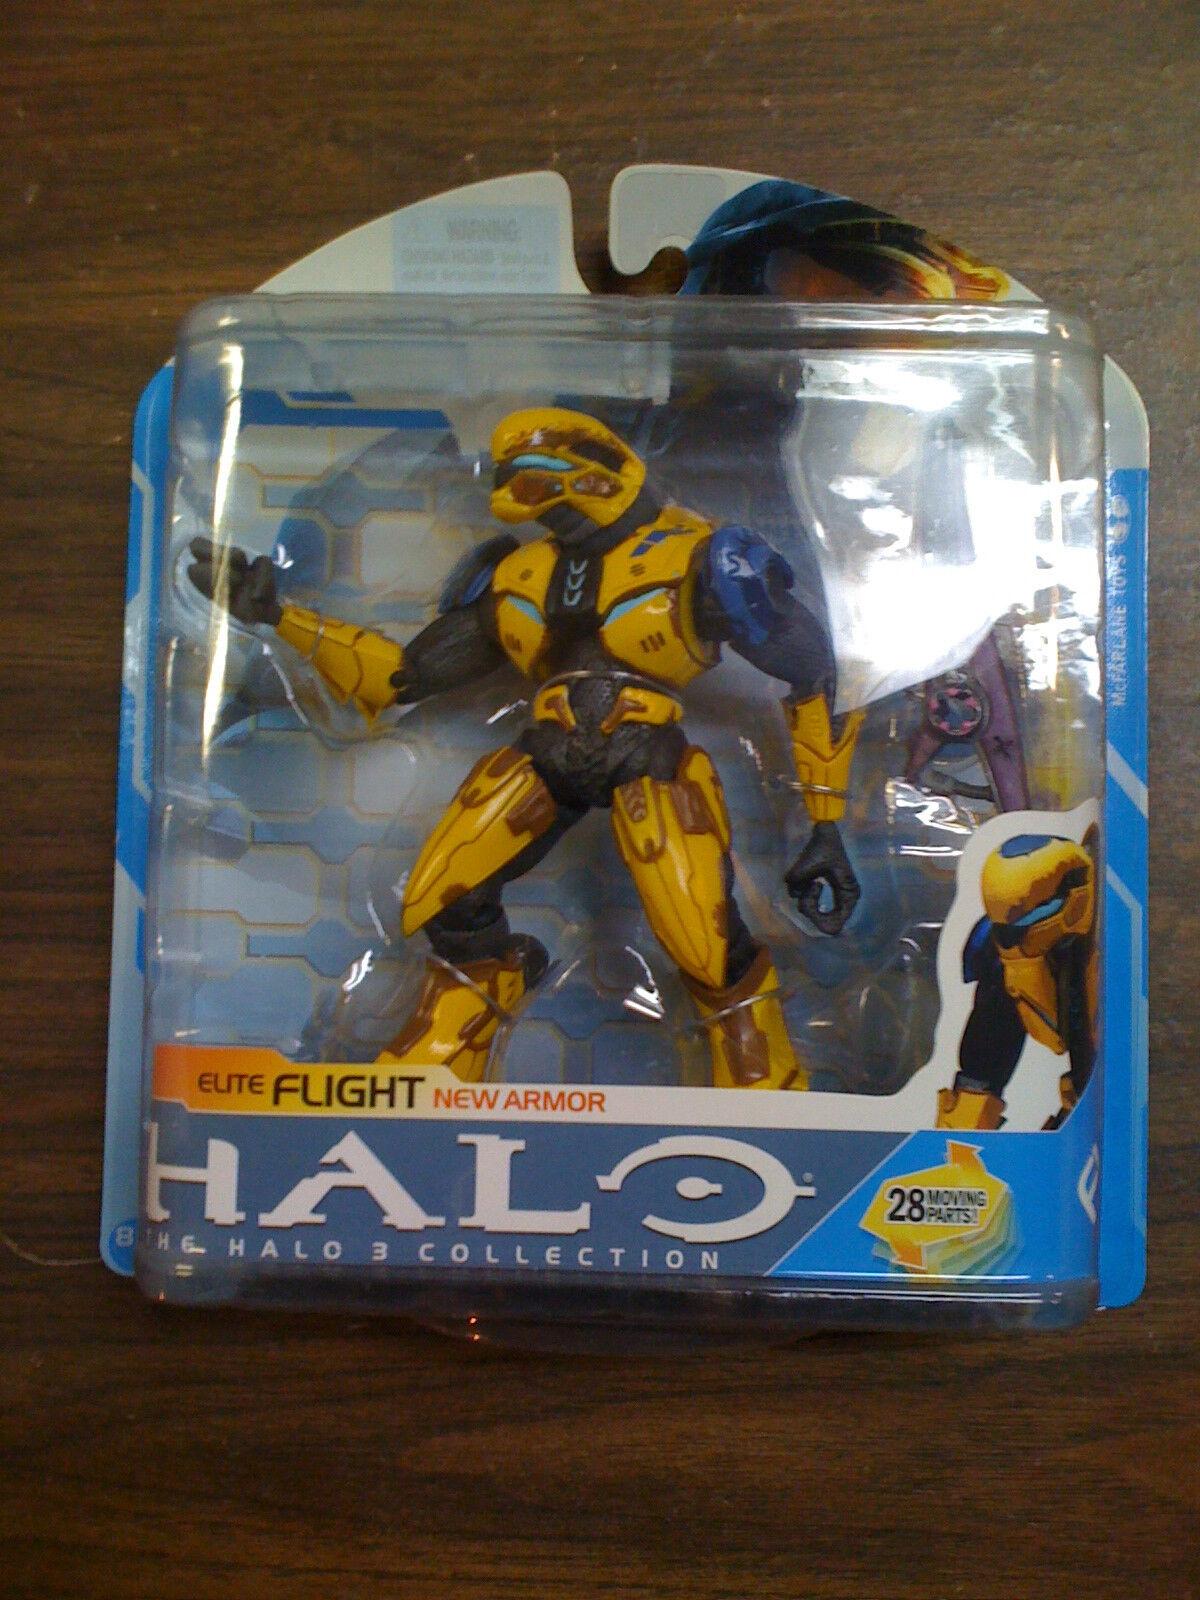 Mcfarlane Halo 3 Collection YELLOW    Elite Flight New Armor NEW Free Ship US 87fa88